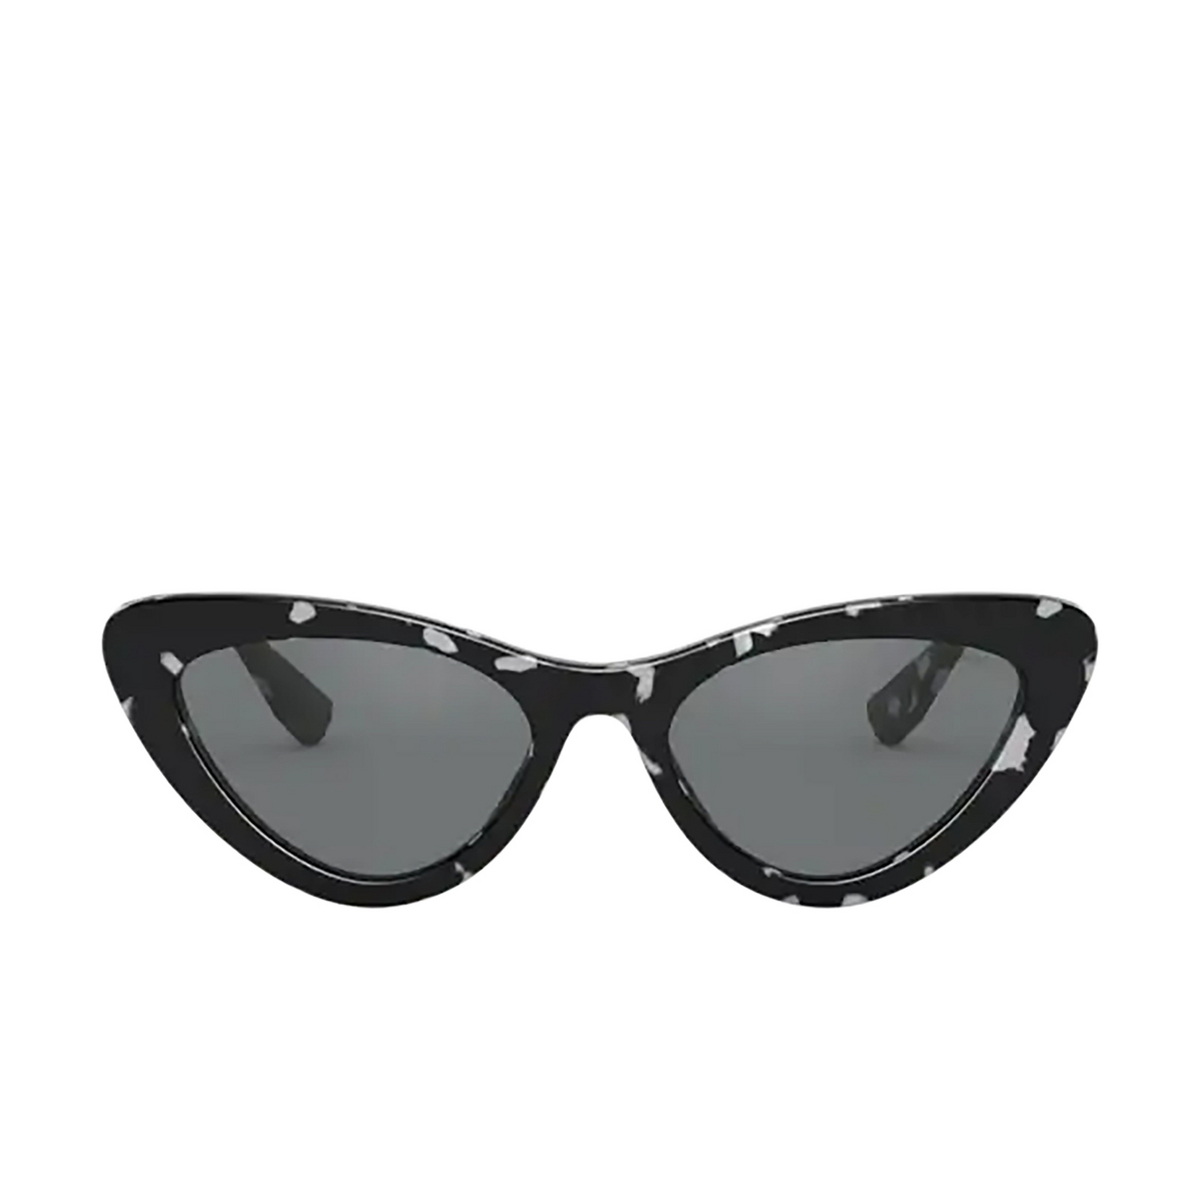 Miu Miu® Cat-eye Sunglasses: MU 01VS color Havana White Black PC79K1.